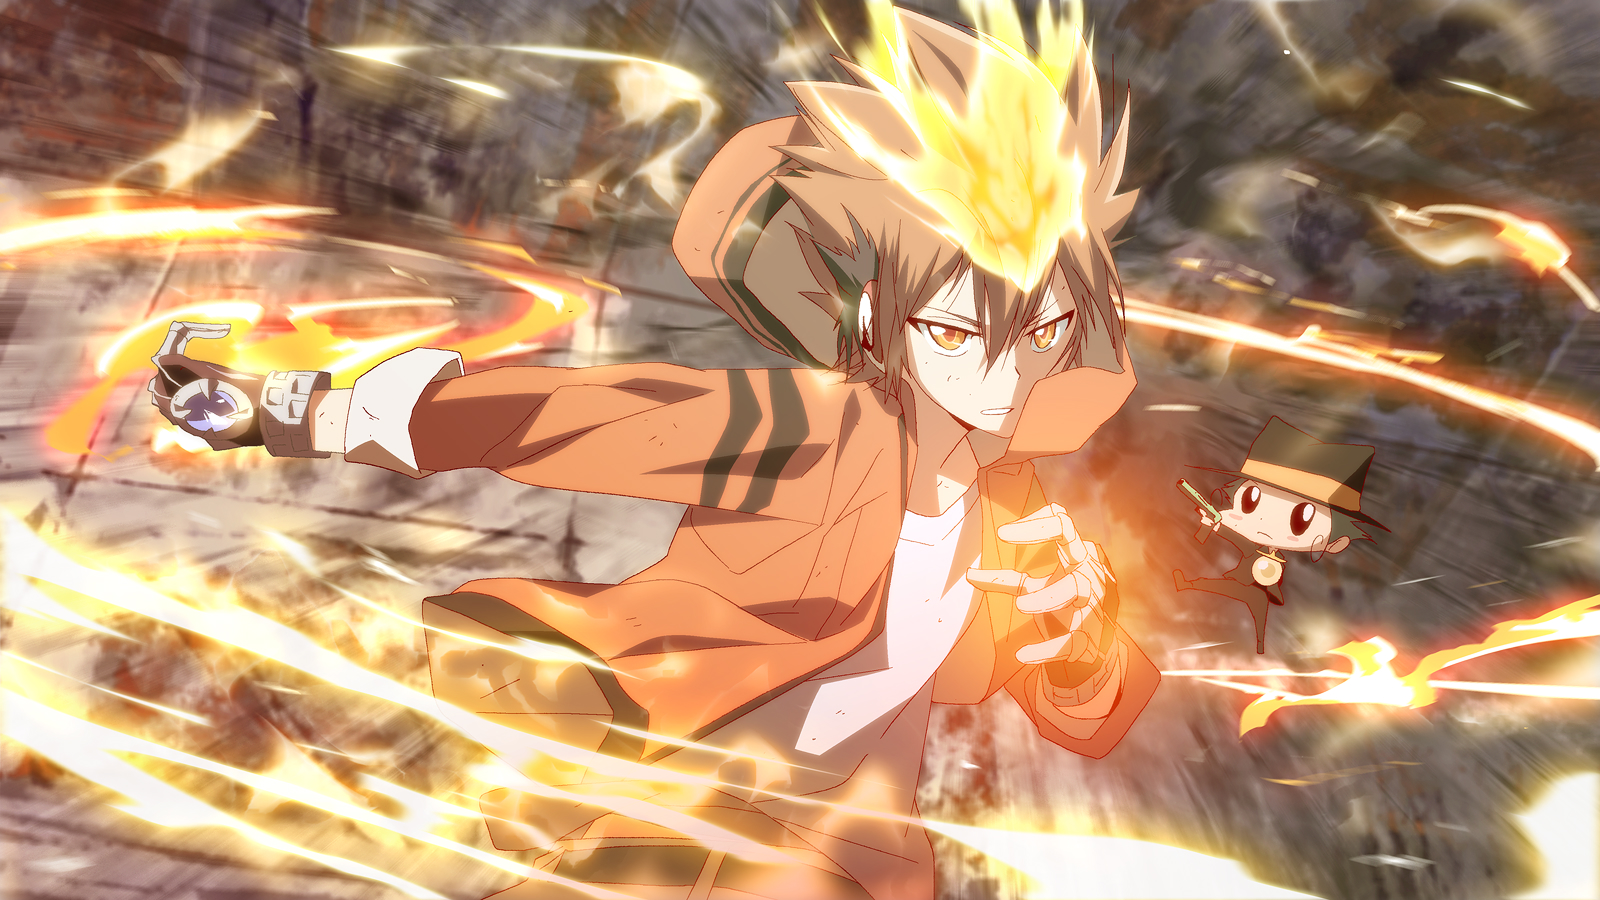 Katekyo hitman reborn wallpaper 1140012 zerochan anime image board view fullsize katekyo hitman reborn image voltagebd Gallery